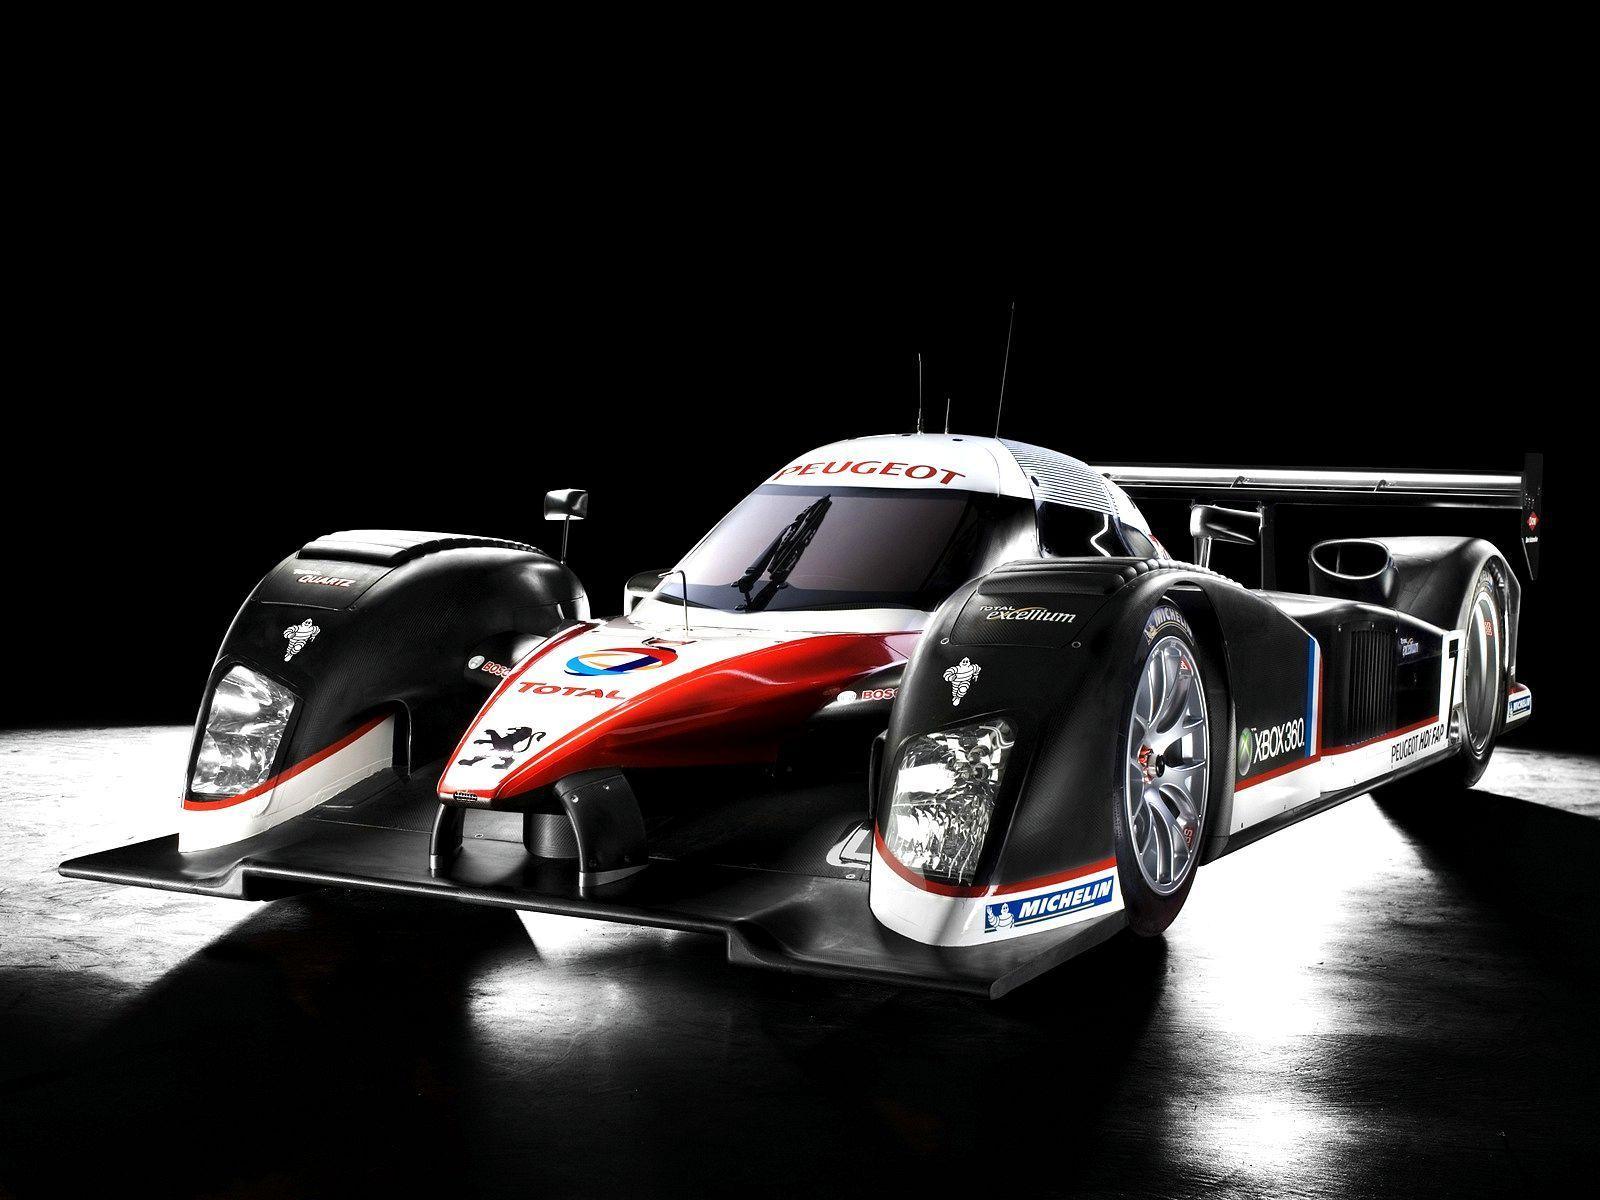 Peugot 980 HDI Le Mans Wallpaper | 1600x1200 | ID:805